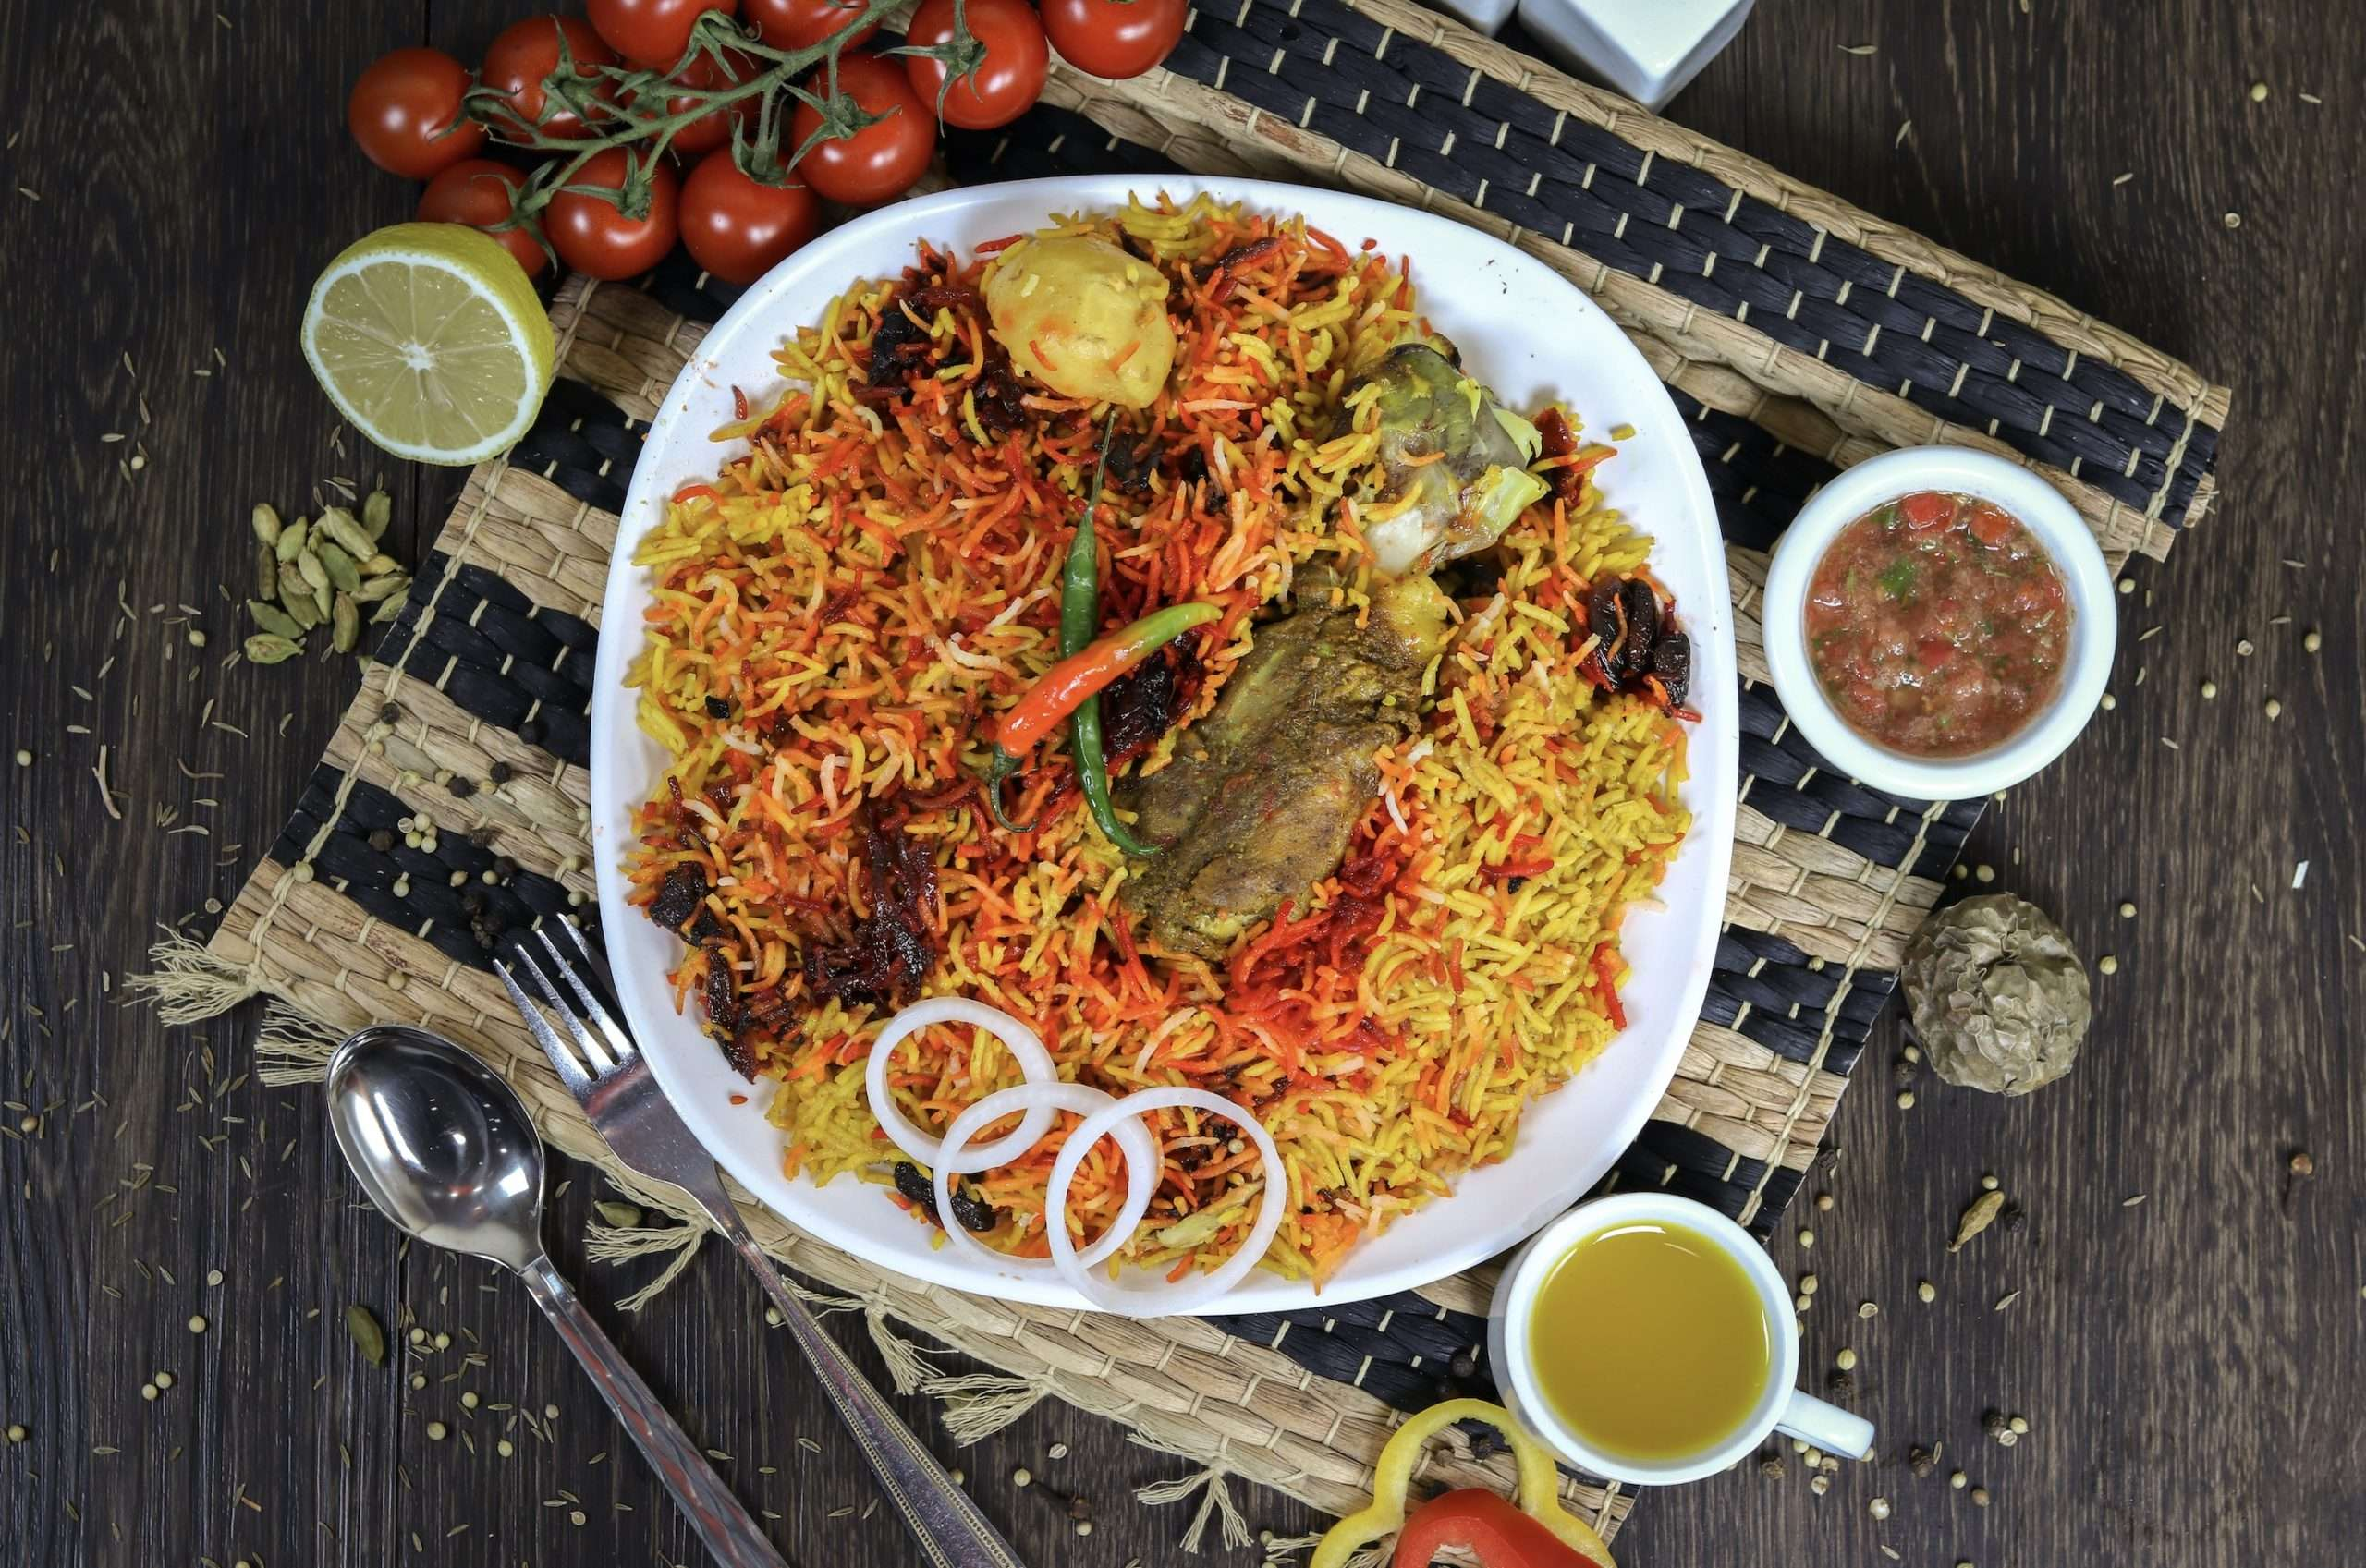 Zurbian: A Festive Yemen Dish